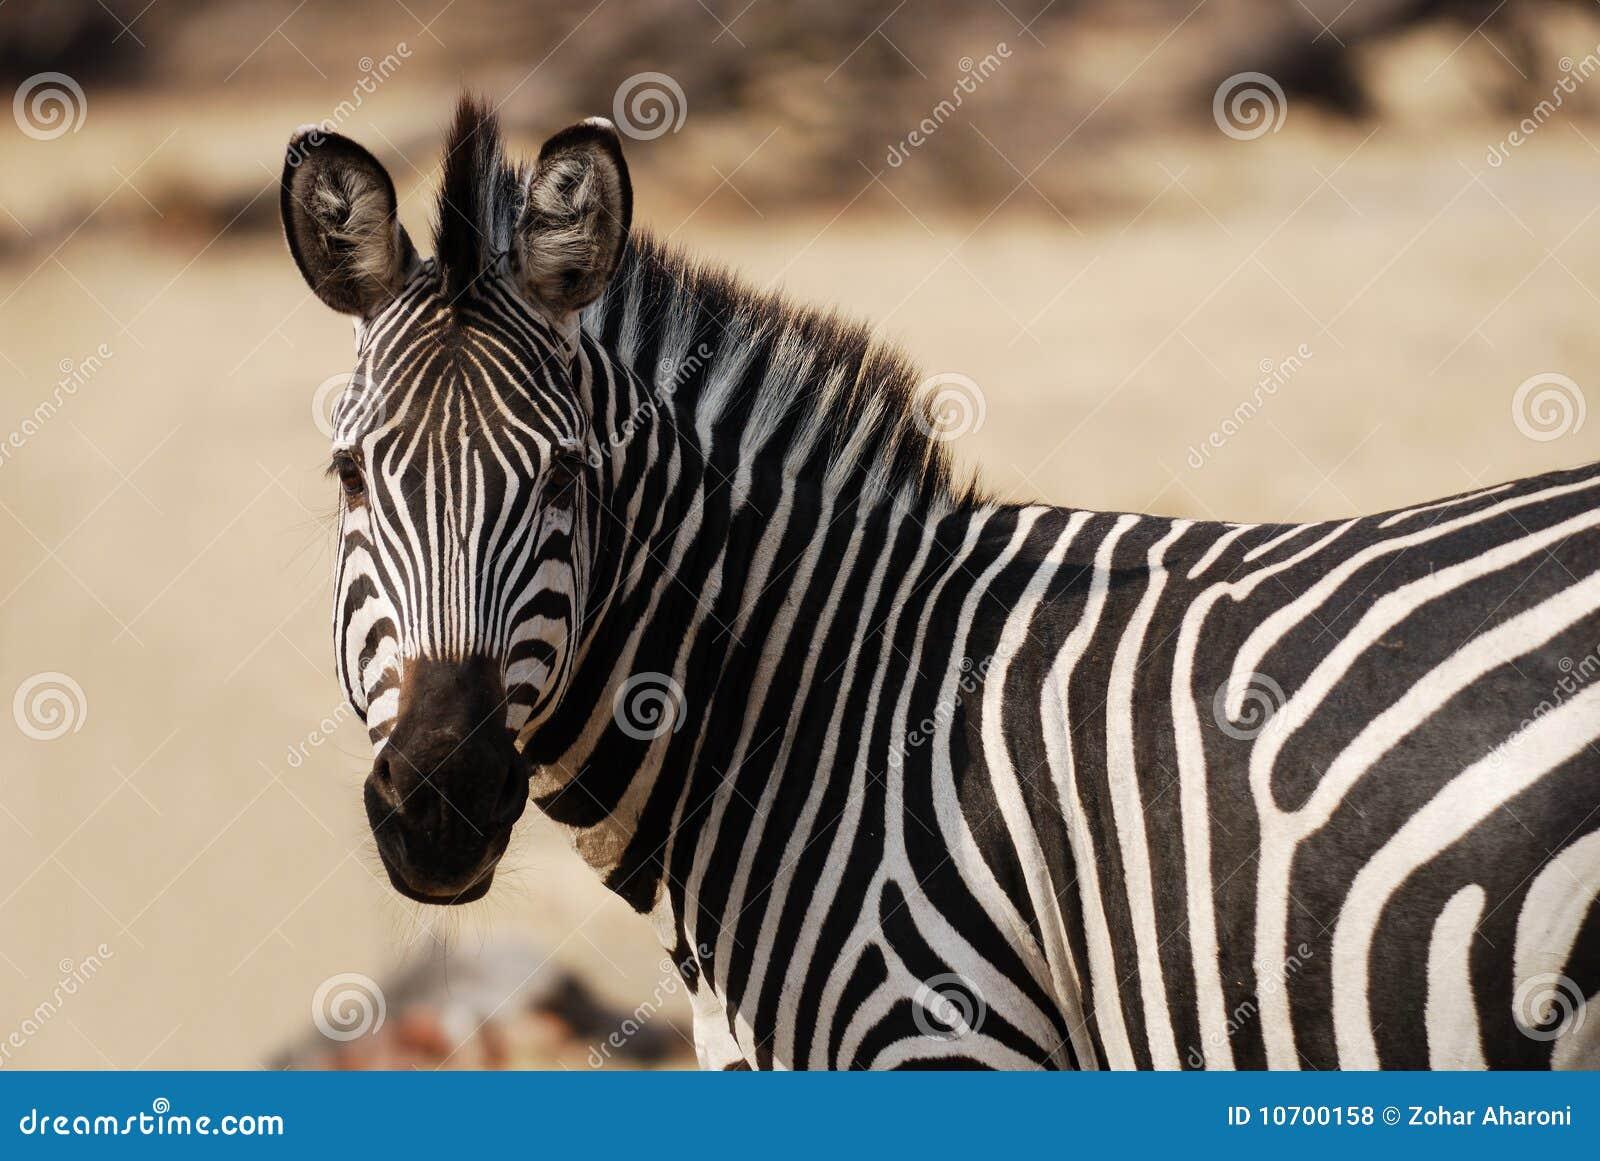 Zebra, der nach links schaut